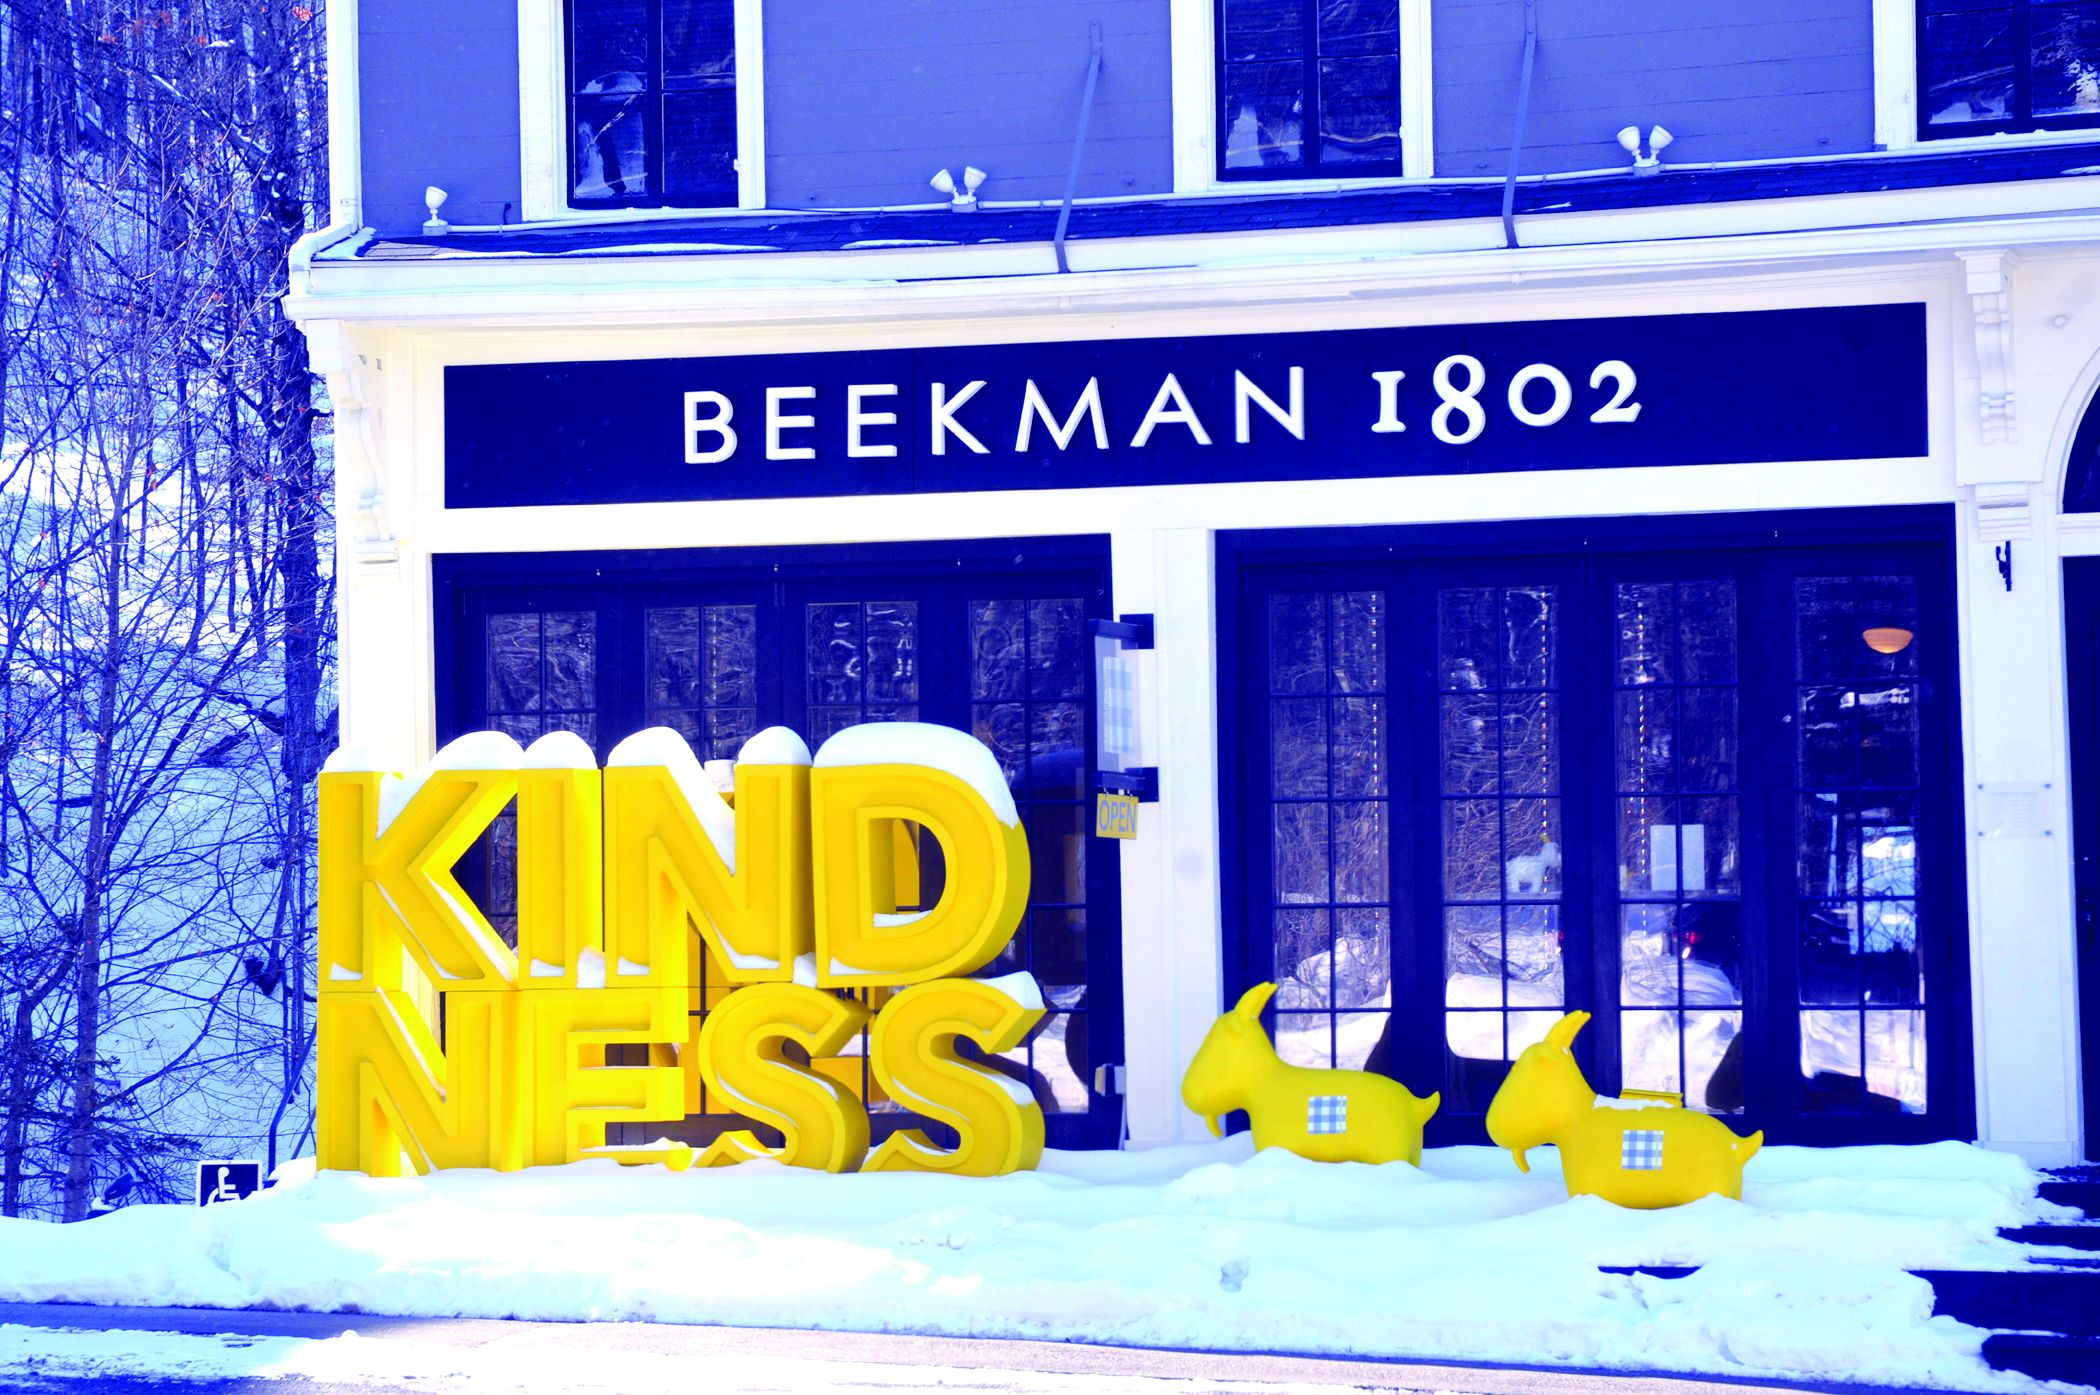 Beekman 1802 spreads kindness to schools